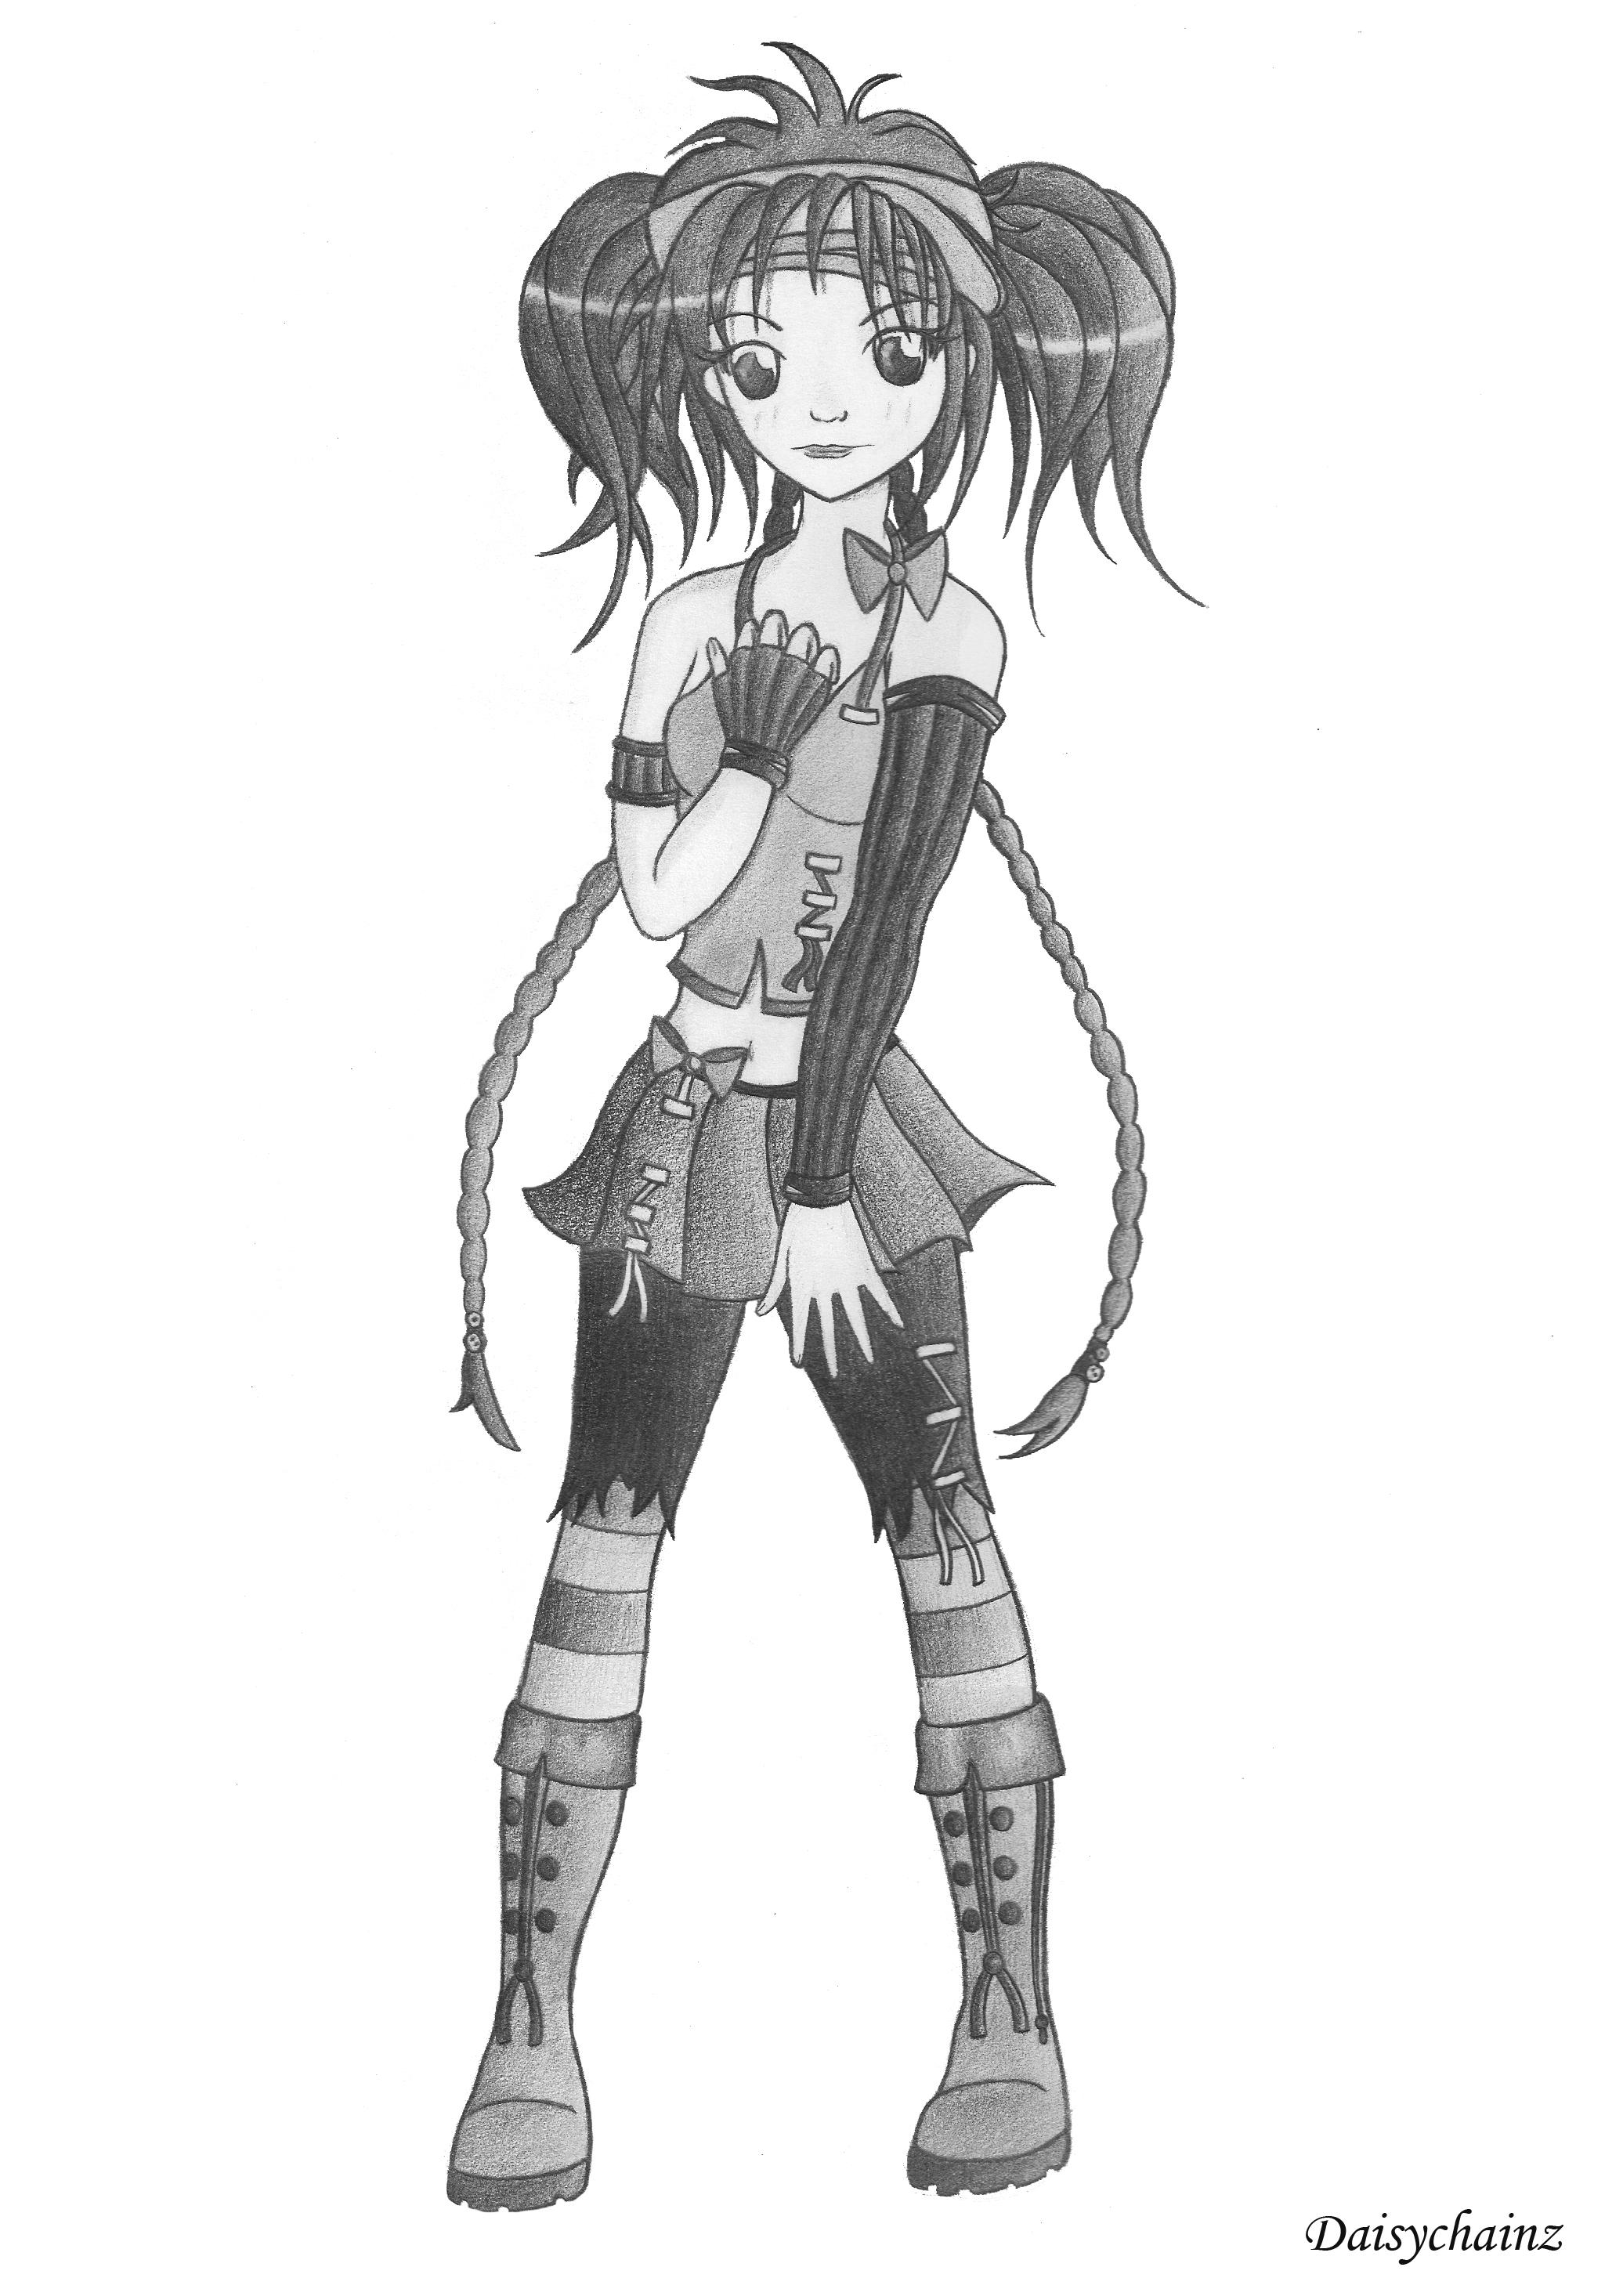 http://fc57.deviantart.com/fs30/f/2008/113/f/5/Punk_girl_Kimmy_by_daisychainz.jpg